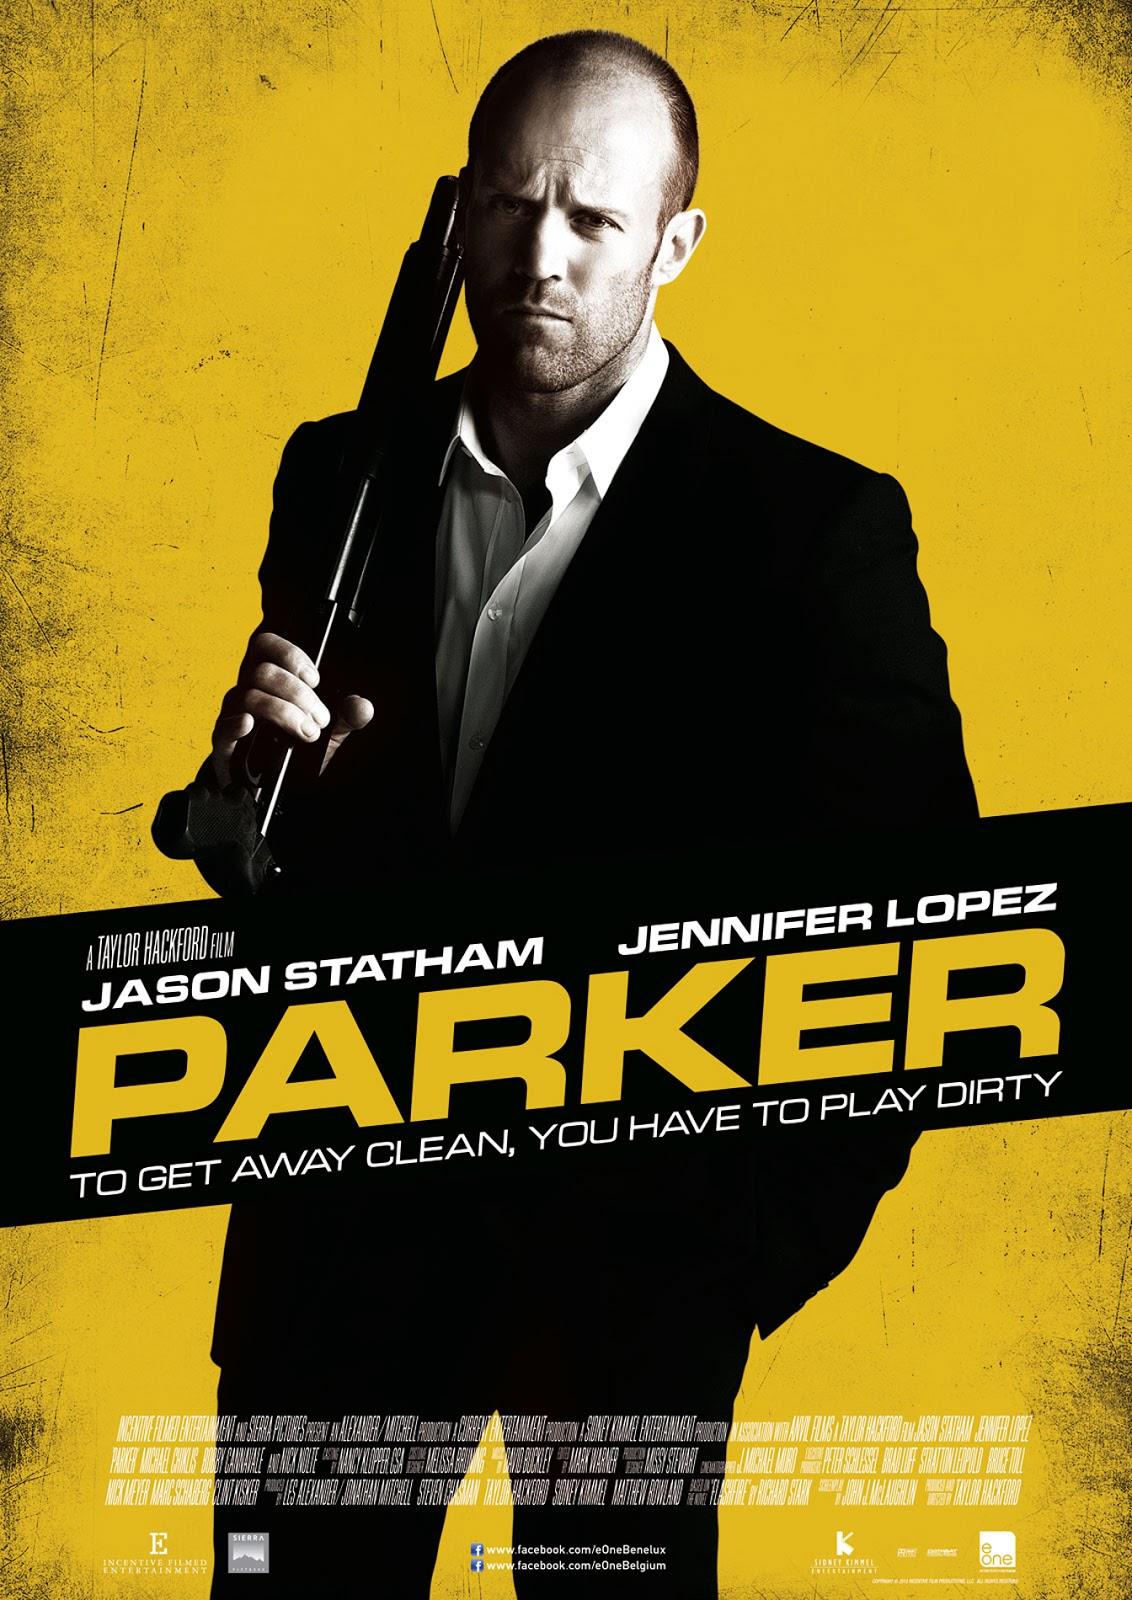 parker movie wallpaper - photo #6